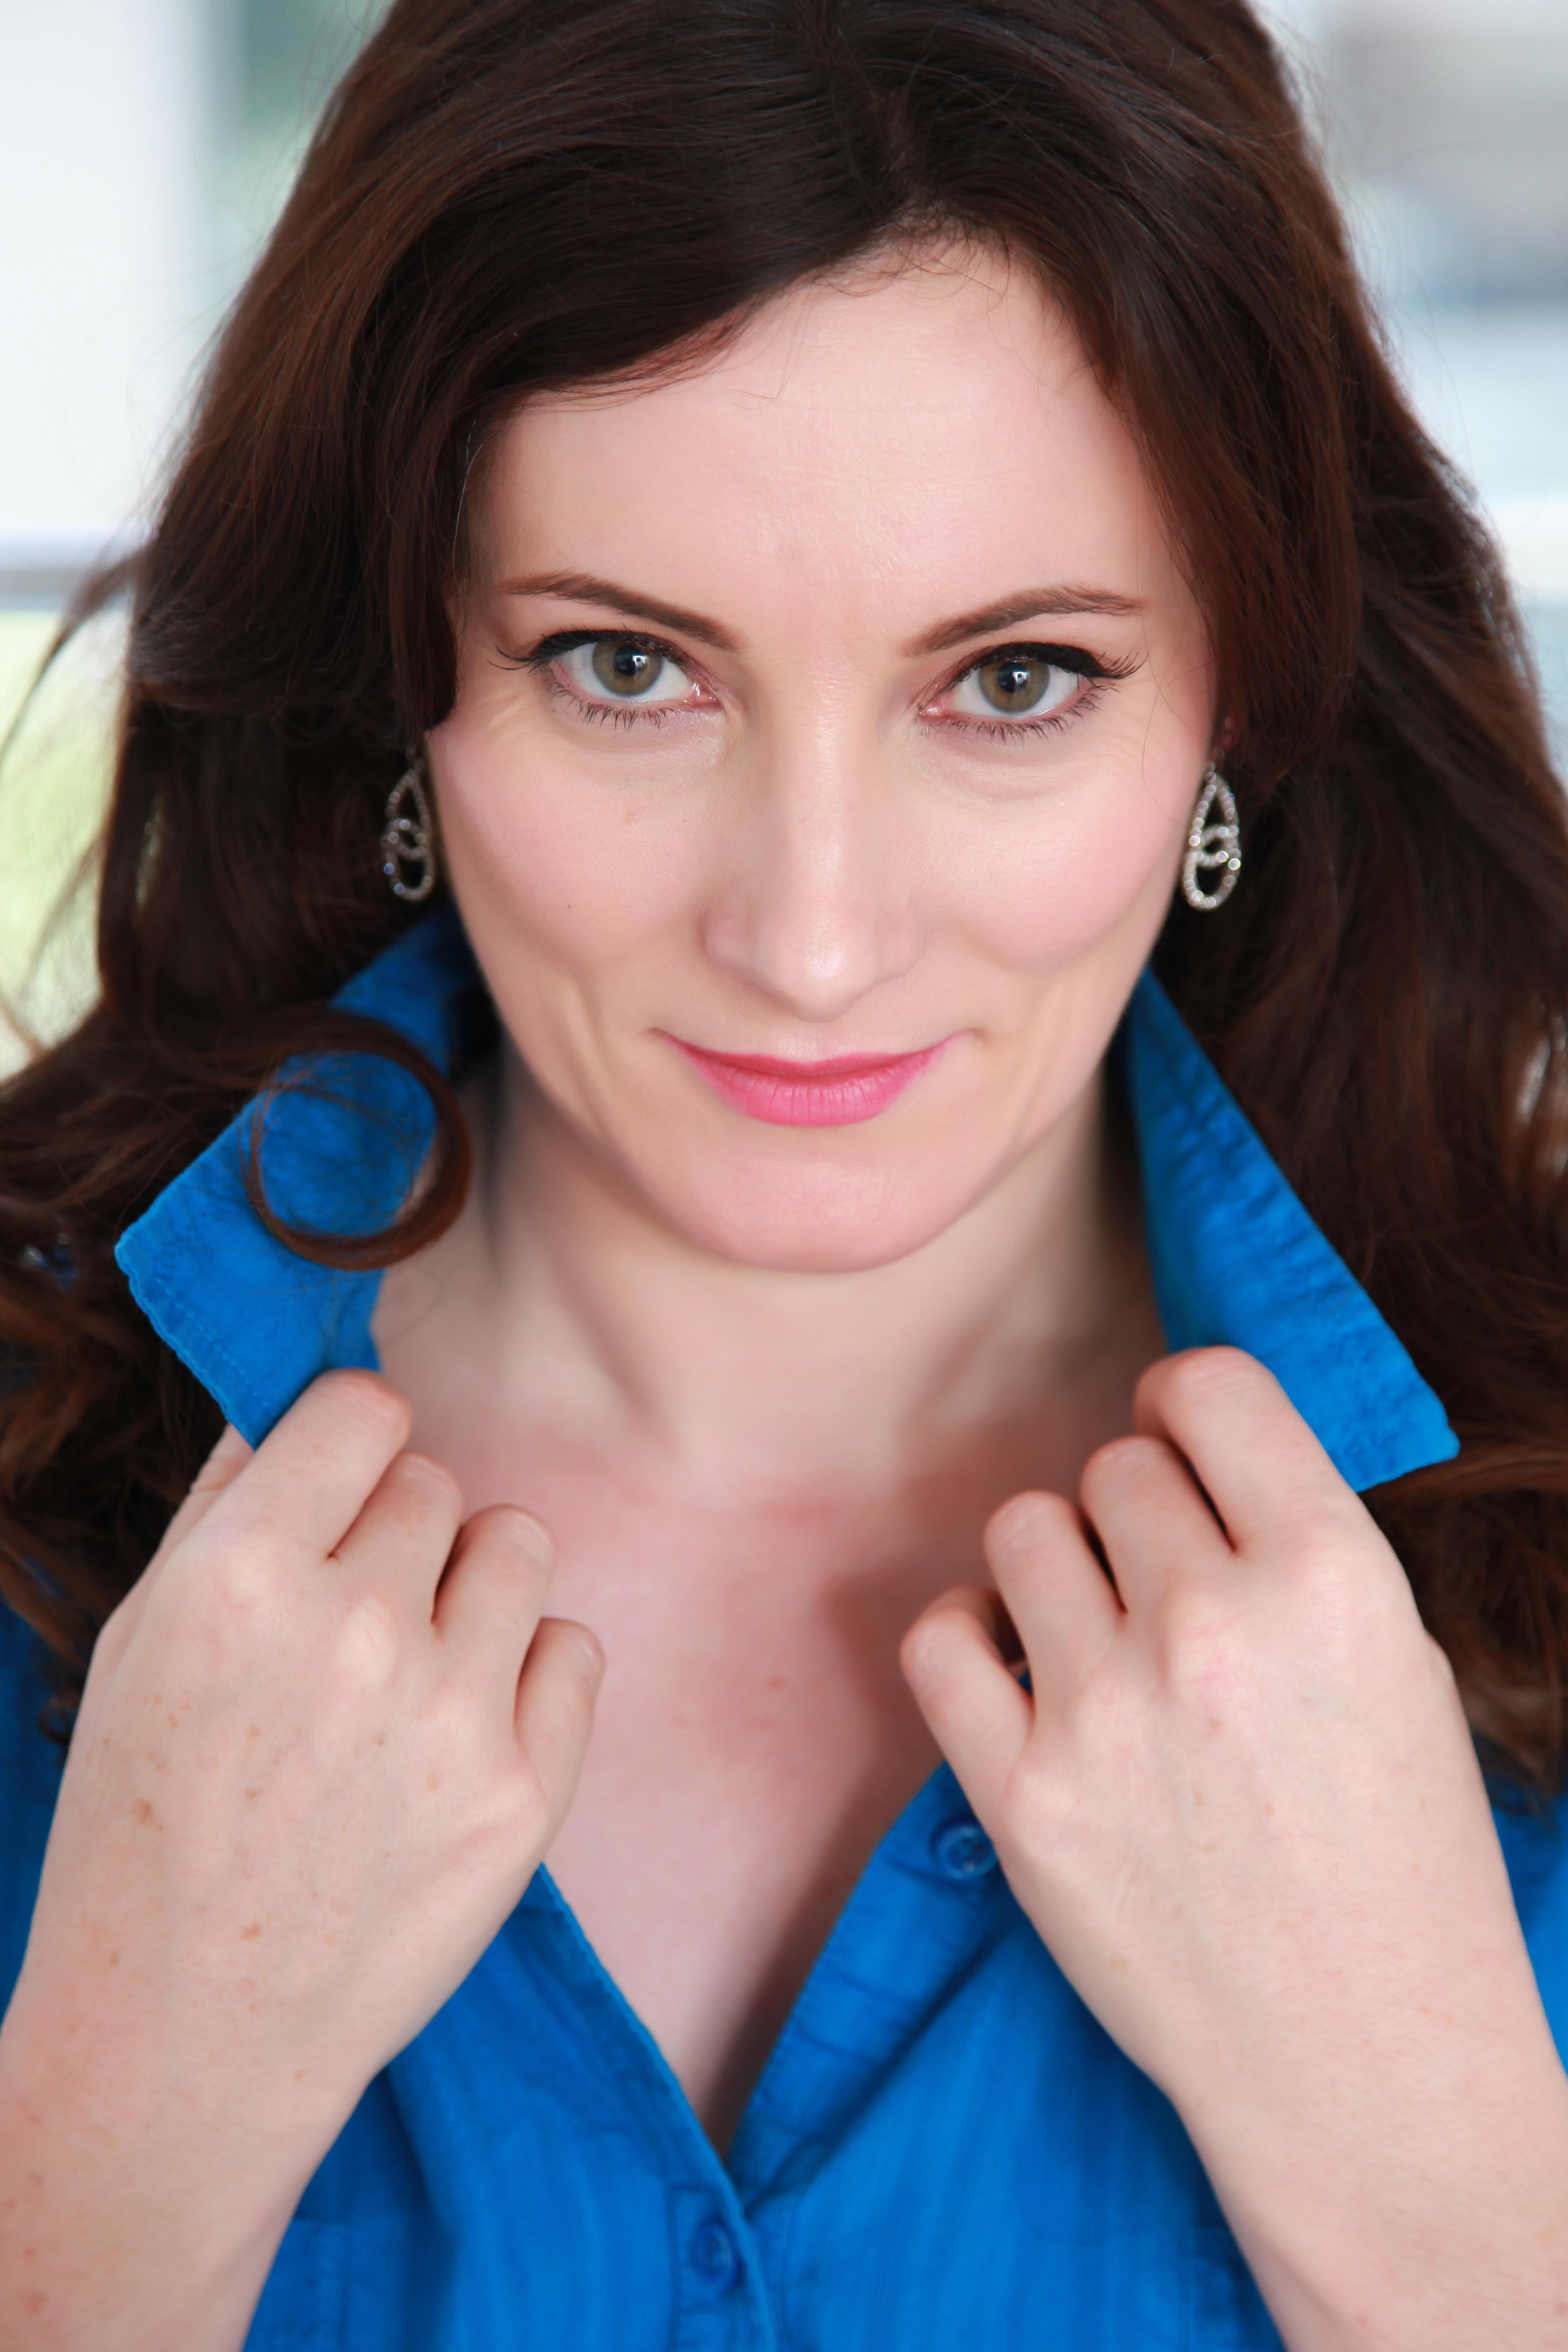 Mezzo-Soprano Kathryn Hannah